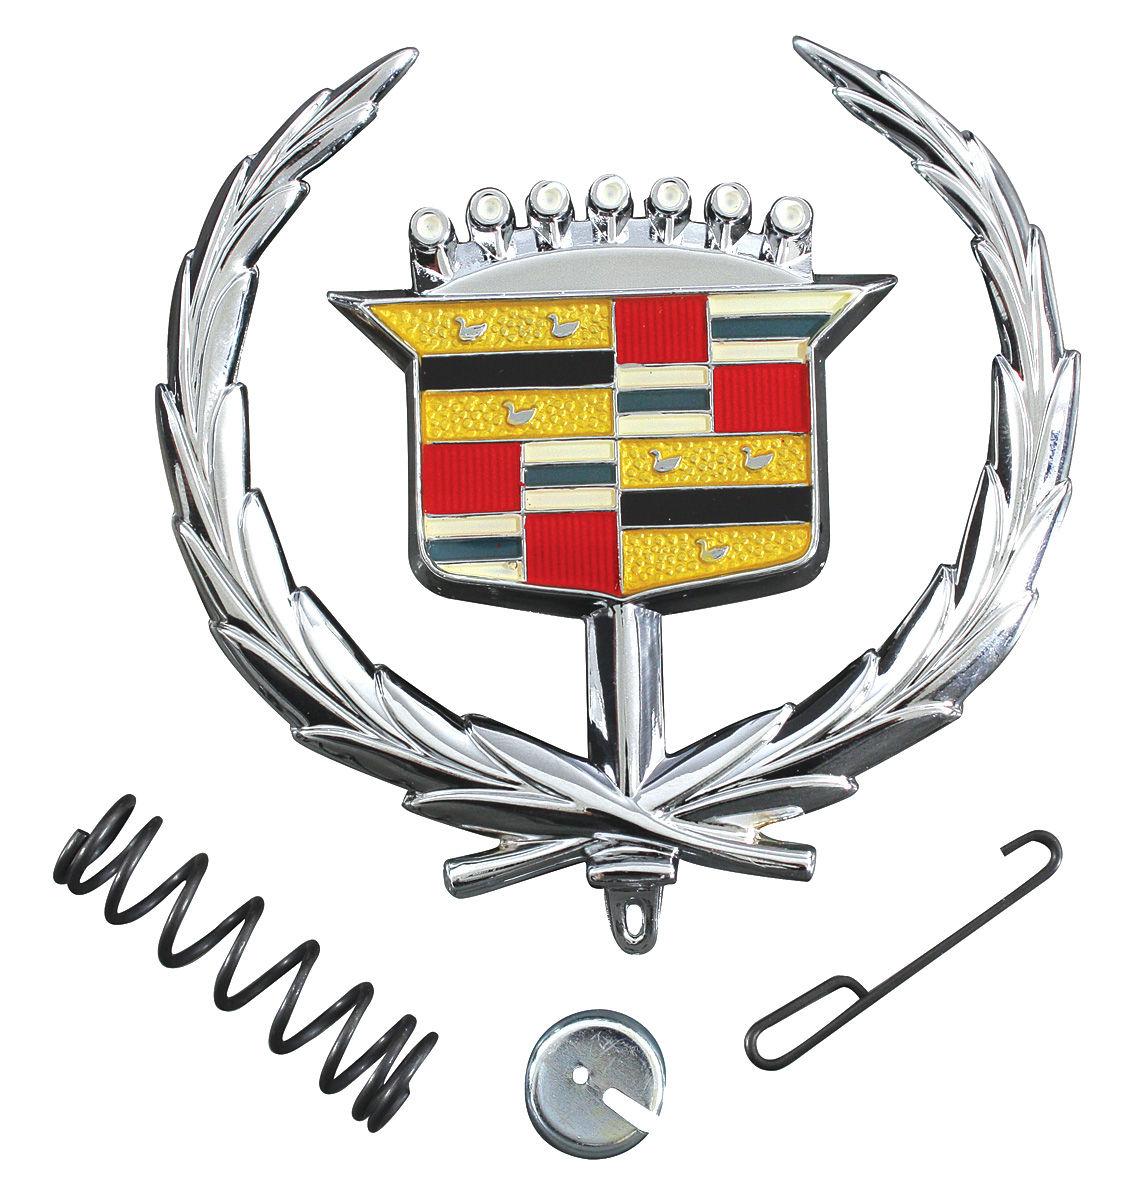 RESTOPARTS Hood Ornament Emblem, 1971-78 Eldorado